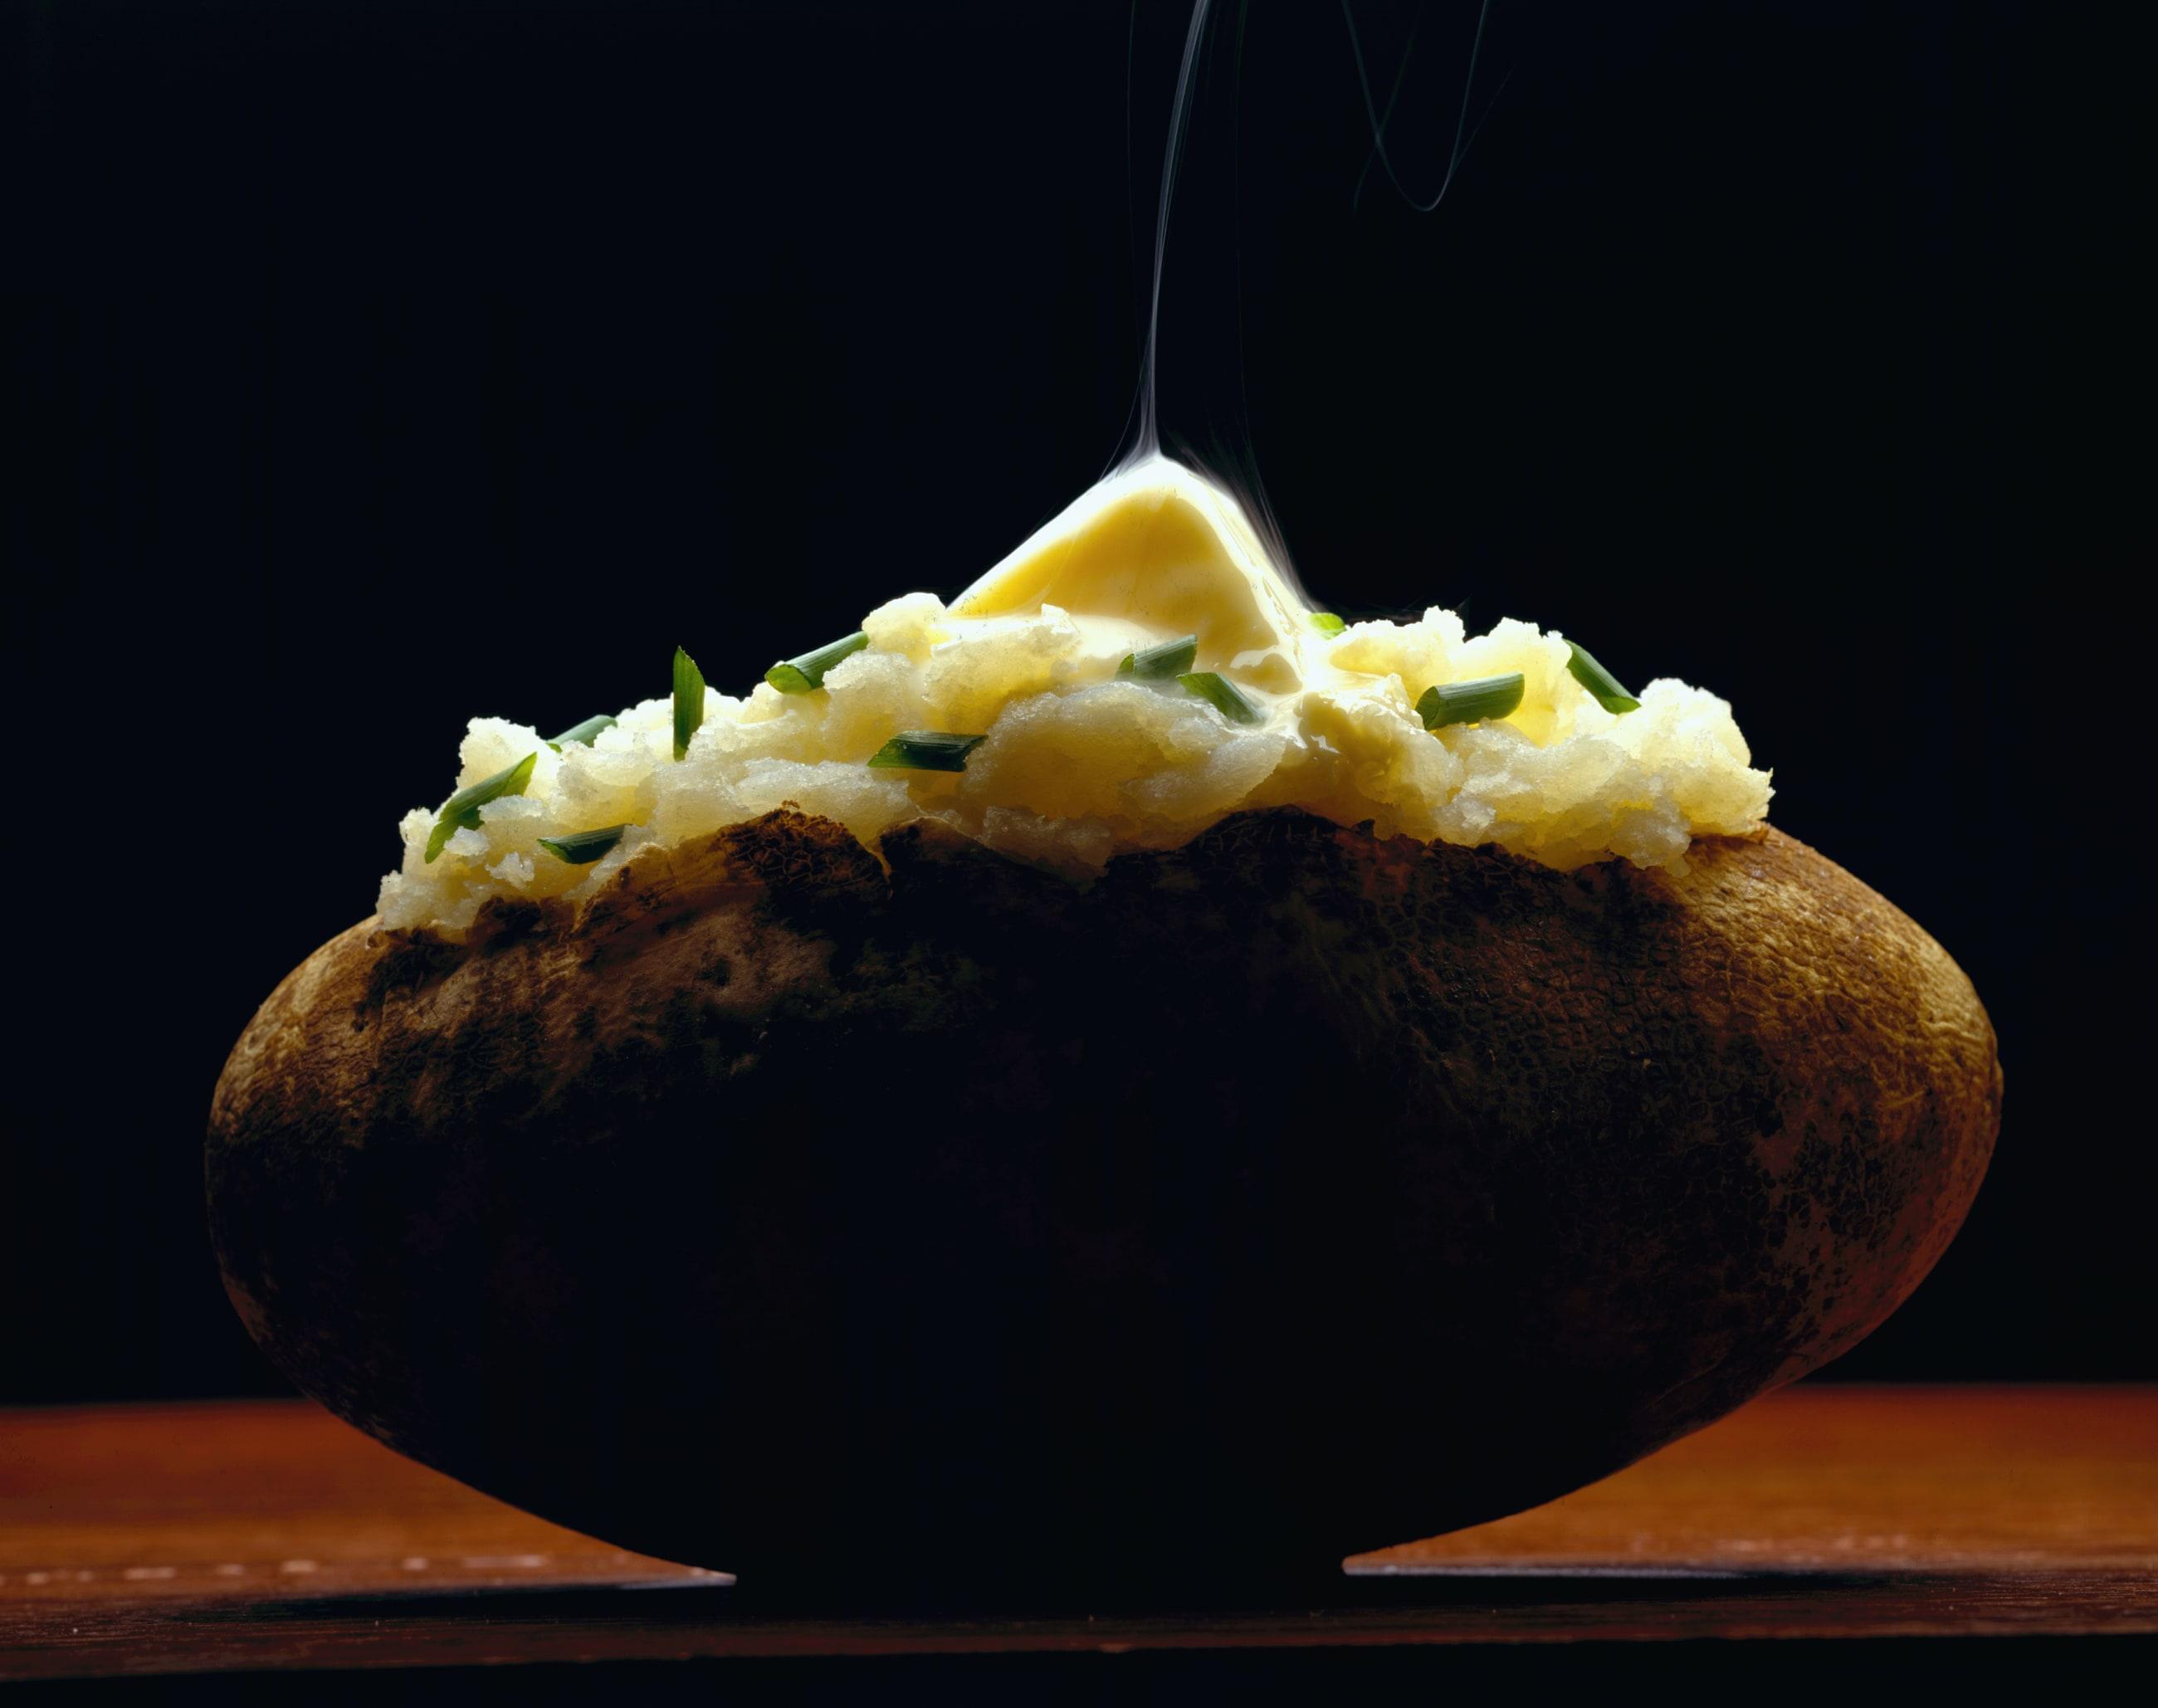 Nice baked Idaho Russet Burbank variety potato